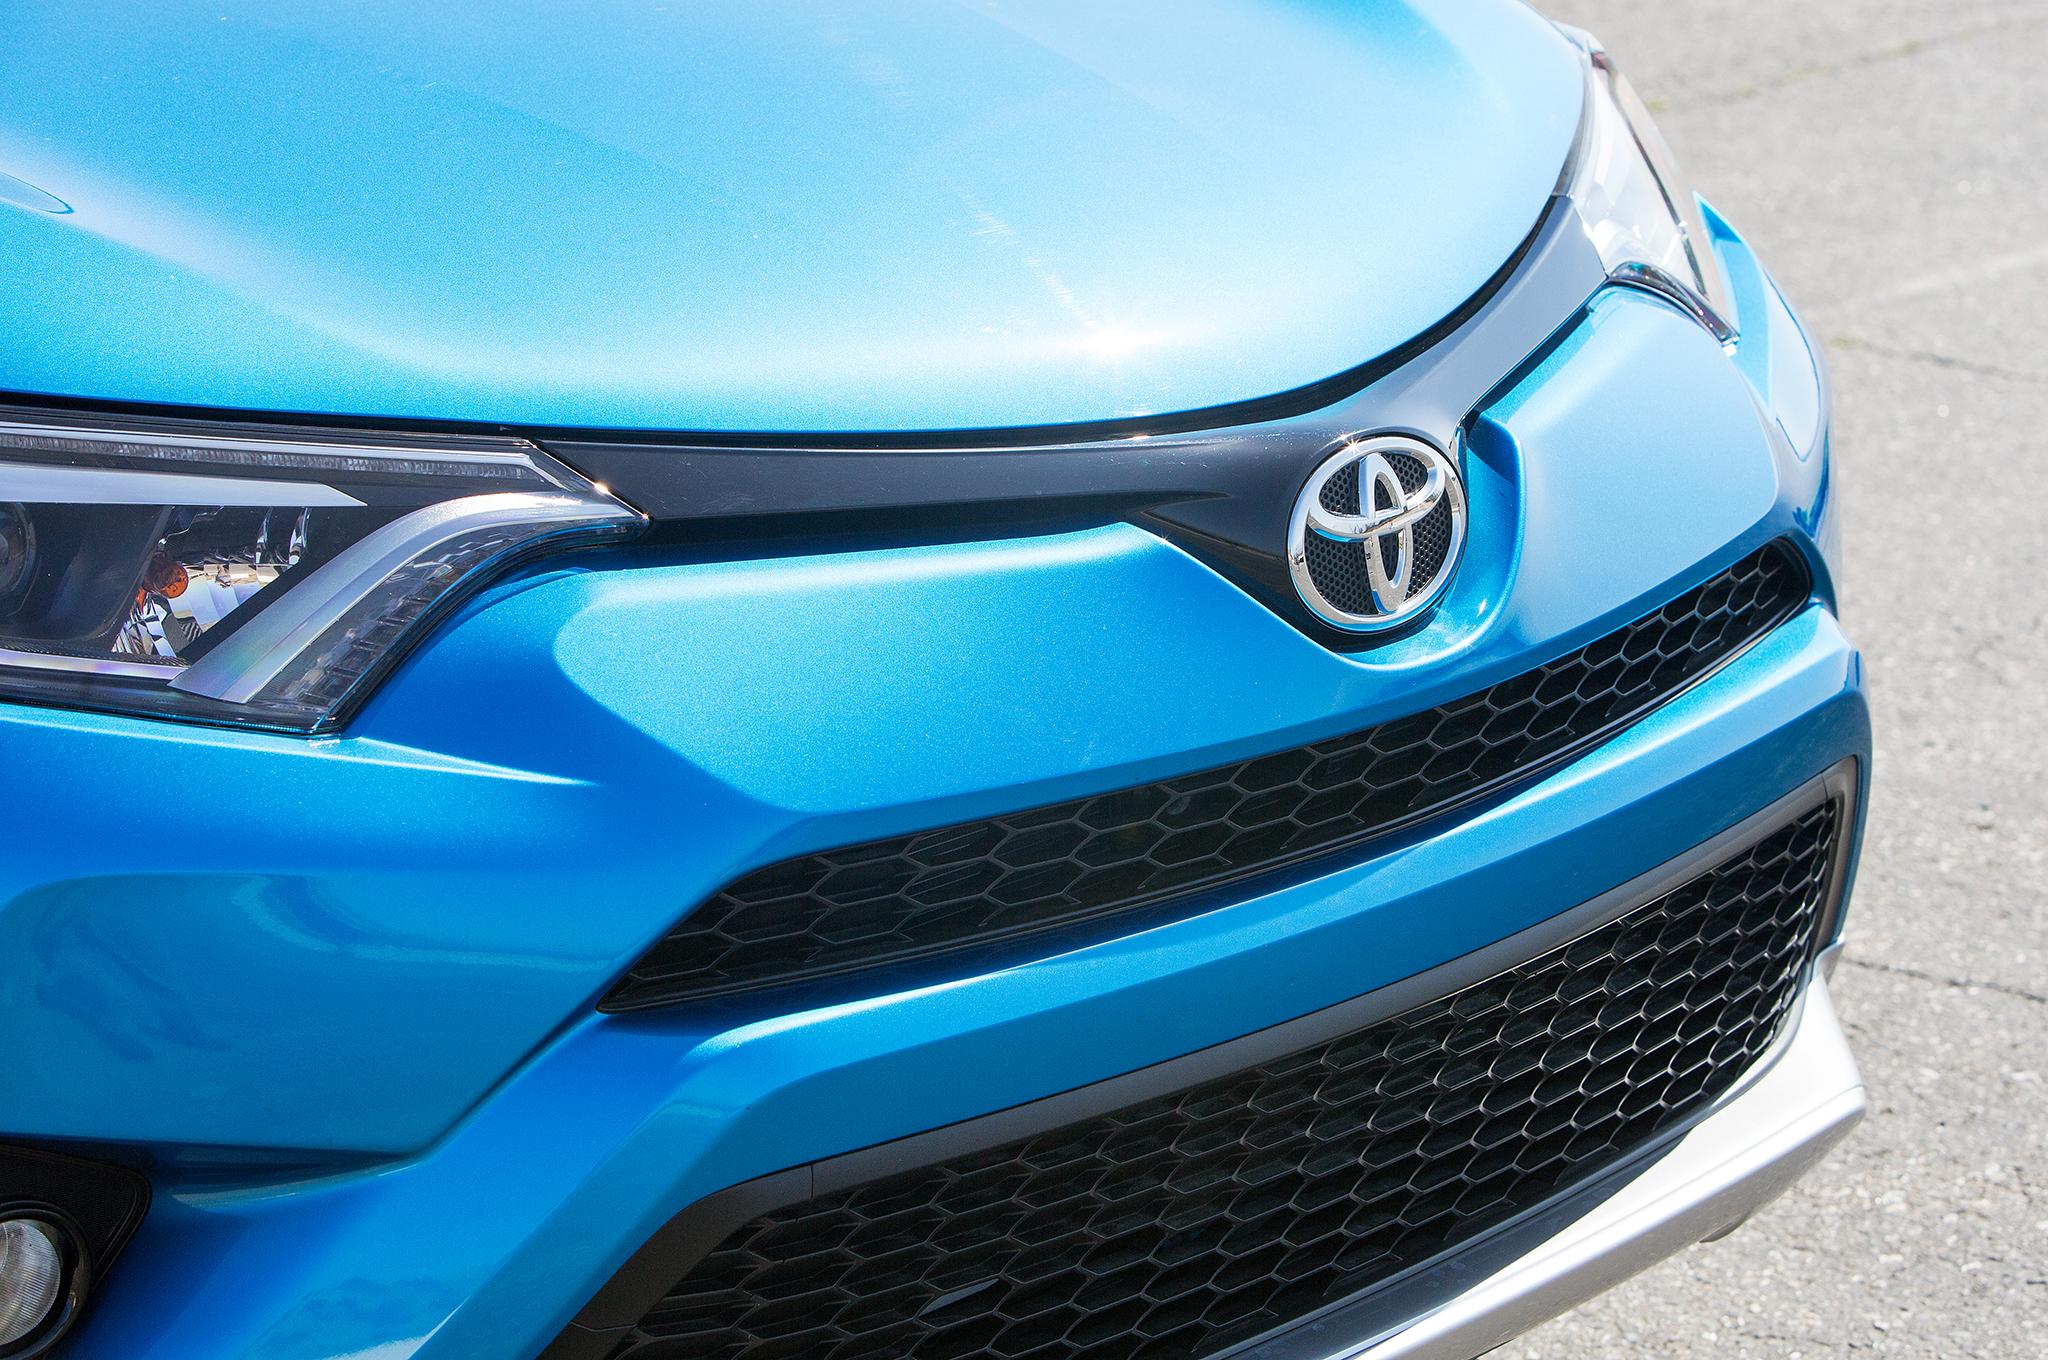 Toyota Tacoma Headlights >> 2019 Toyota RAV4 Price, Specs, Engine, Interior, Design